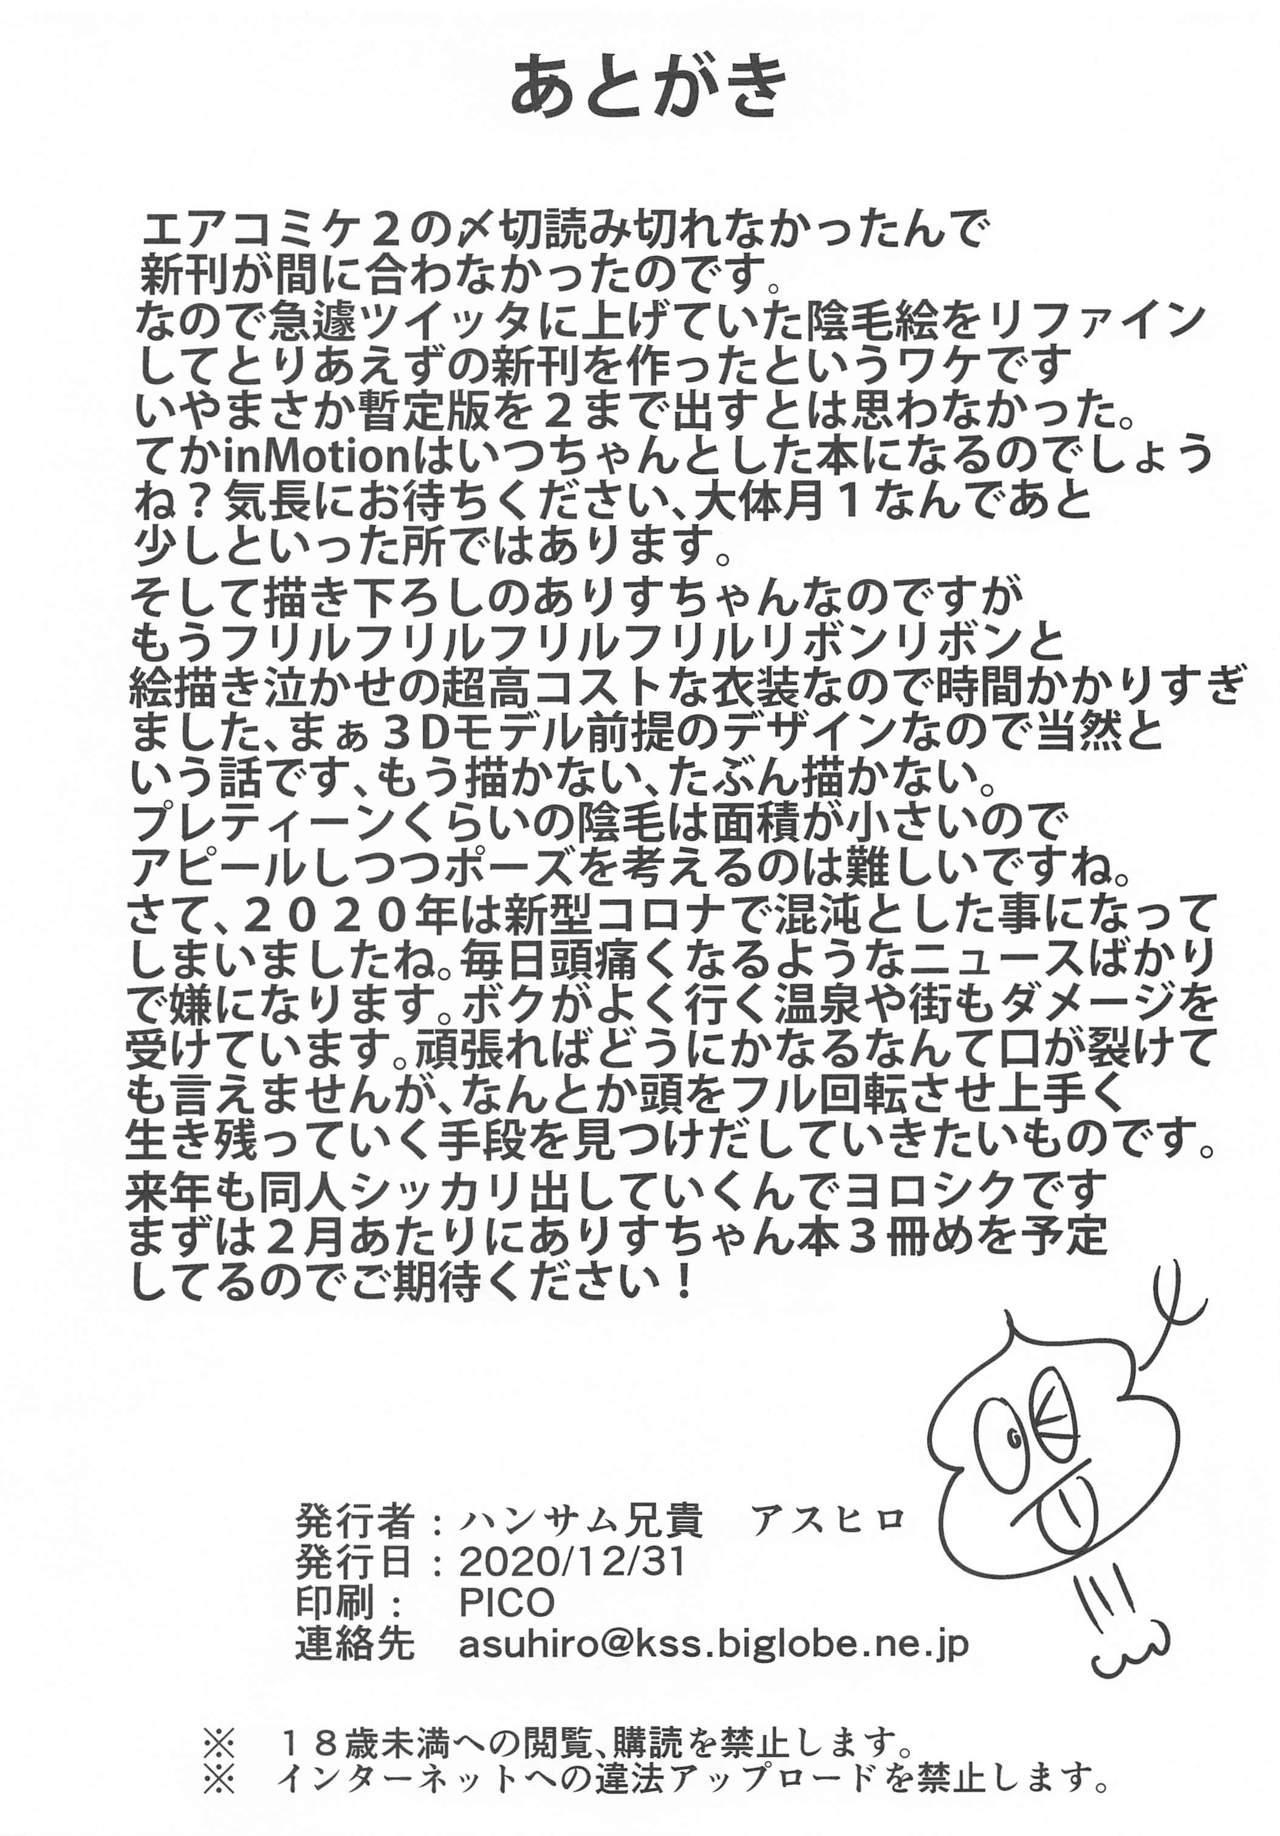 (AC2) [Handsome Aniki (Asuhiro)] inMotion ~Inmou Shijou Shugi~ Zanteiban 2 (THE IDOLM@STER CINDERELLA GIRLS) 9